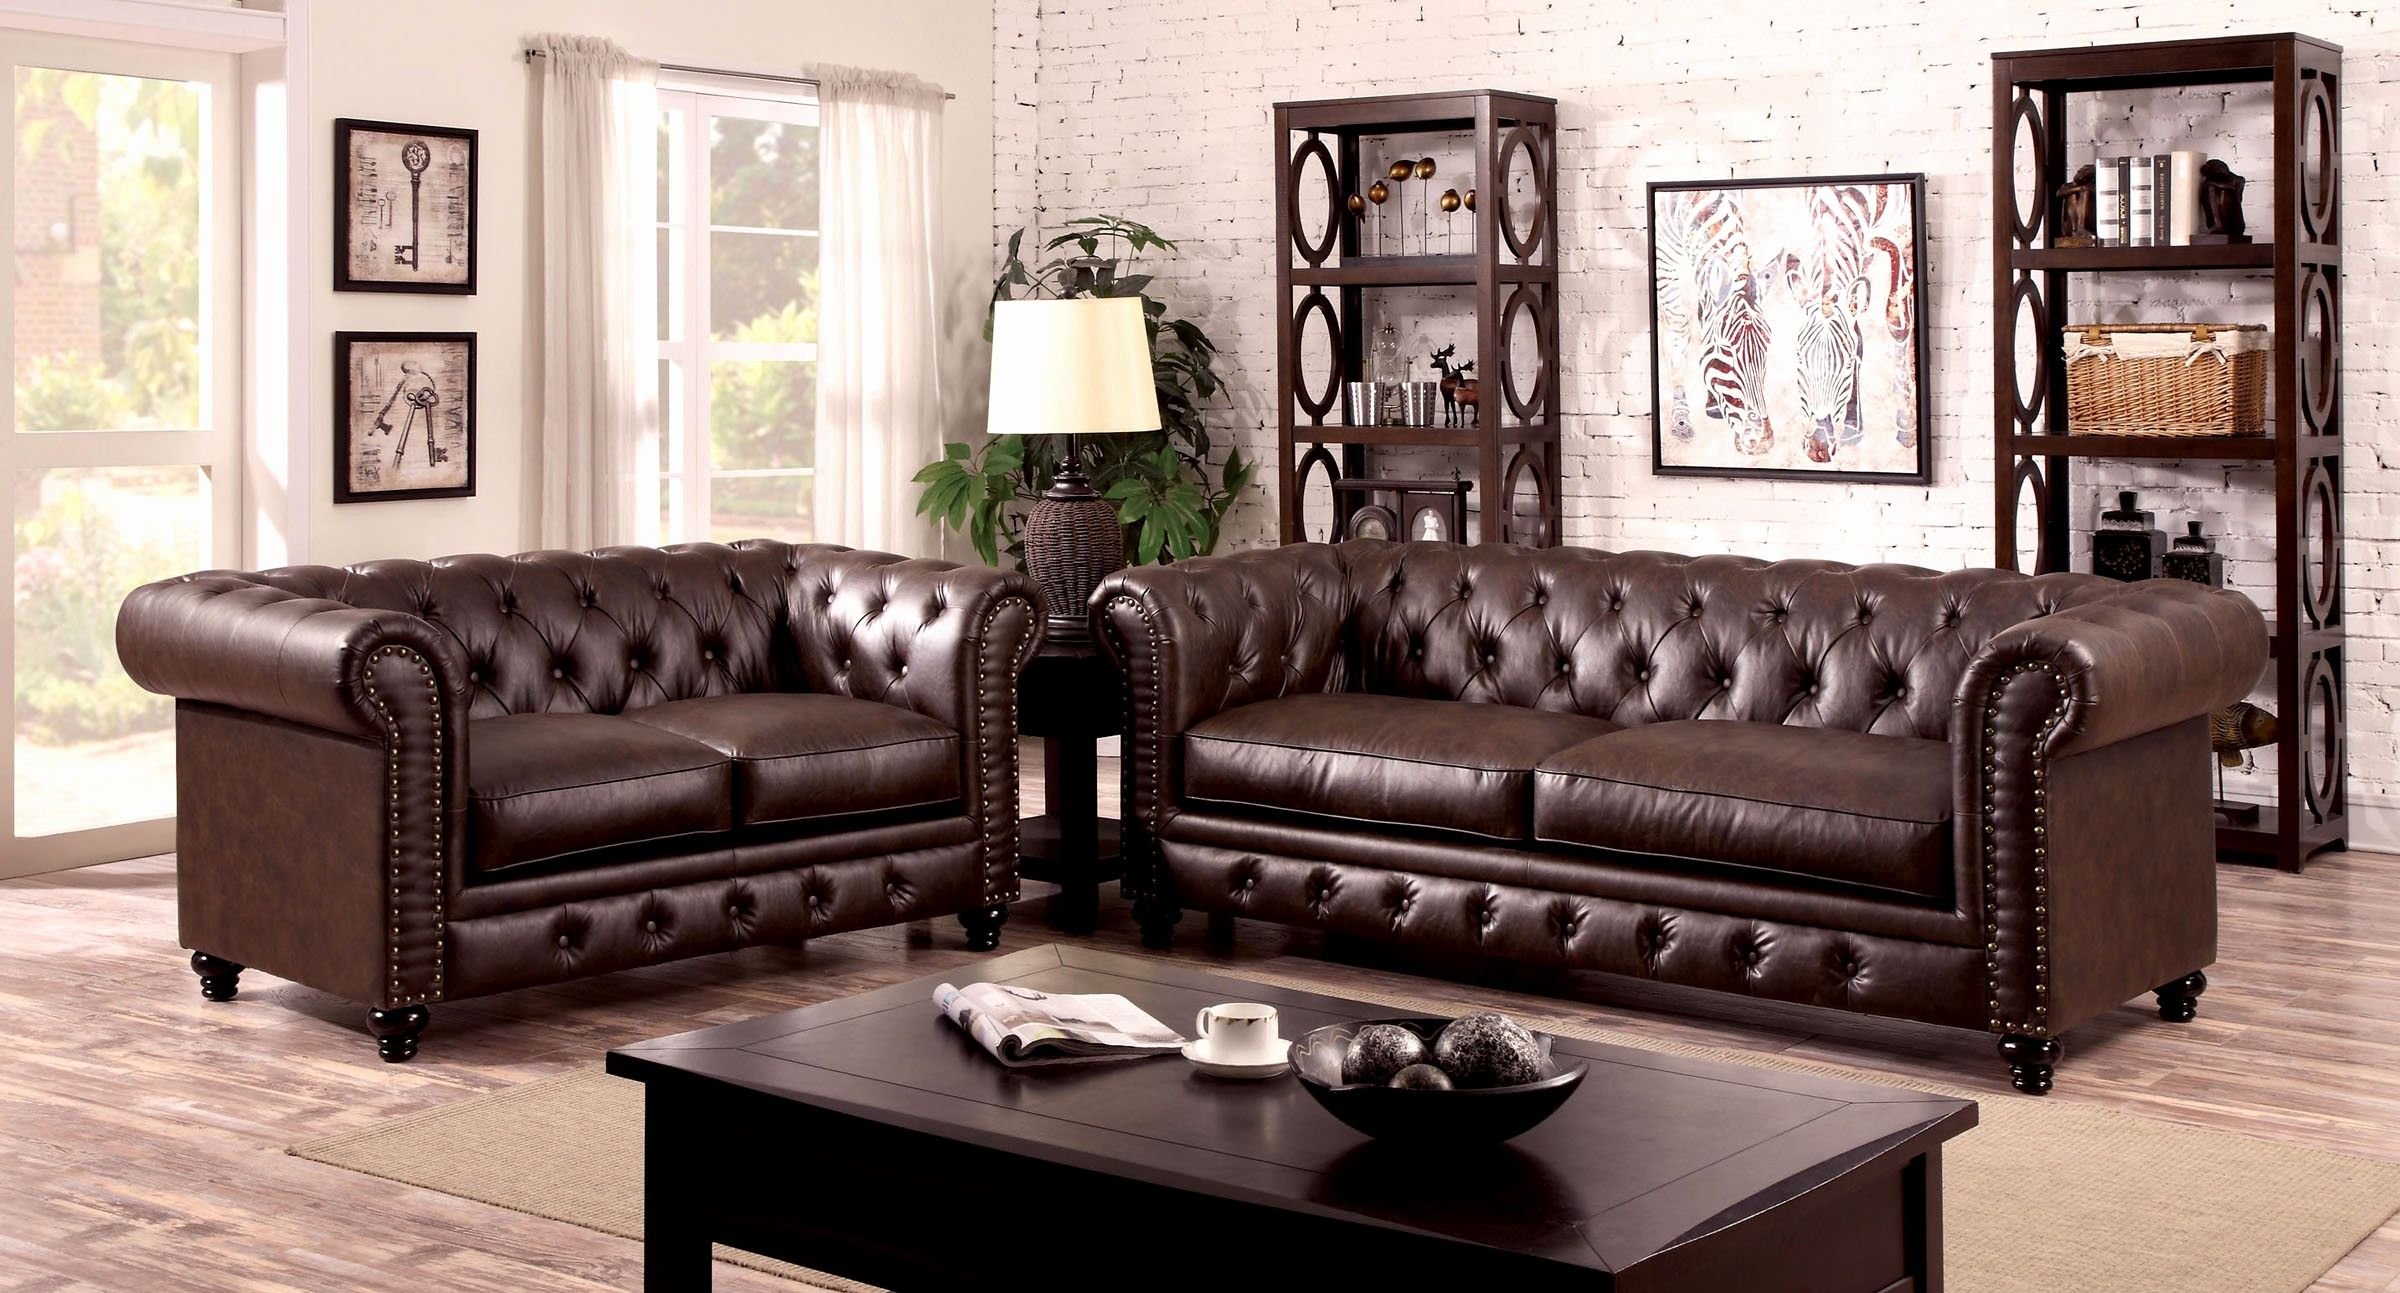 Sofa Set Photograpy Burgundy